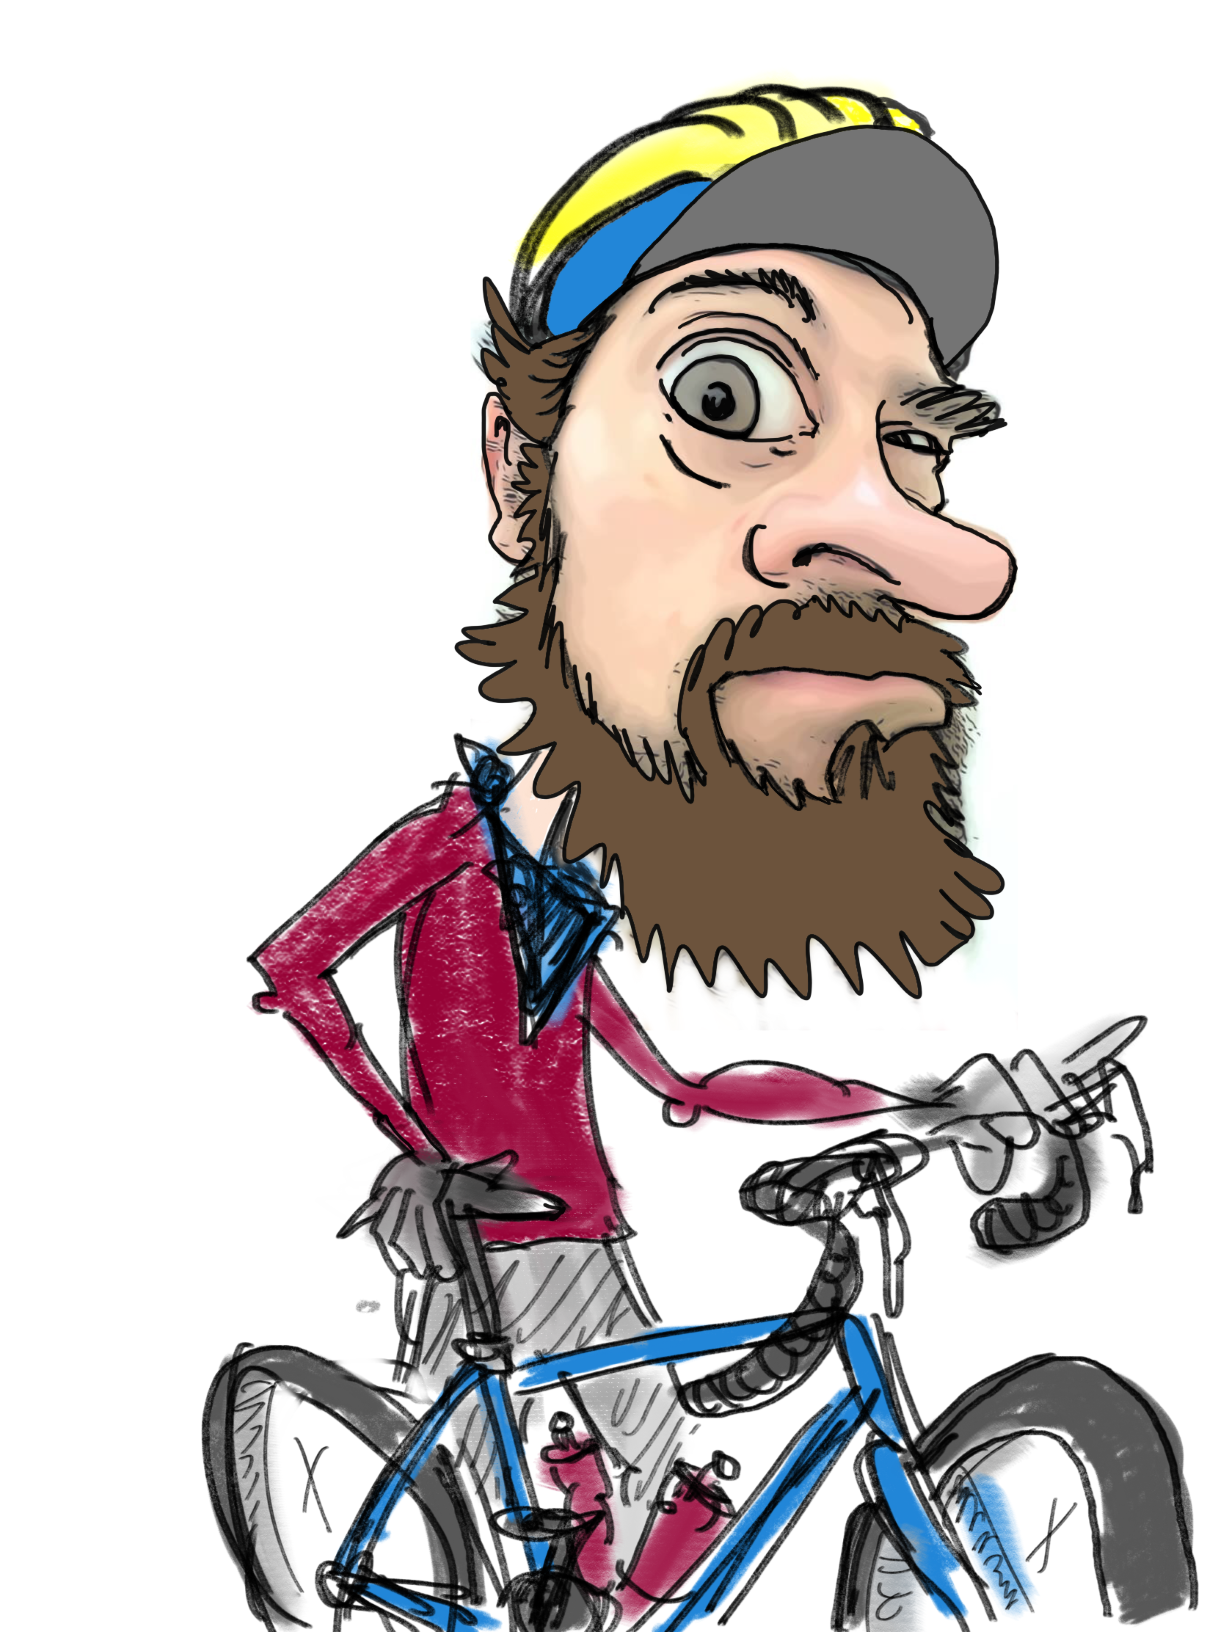 Self portrait illustration of cyclist Justin Short.